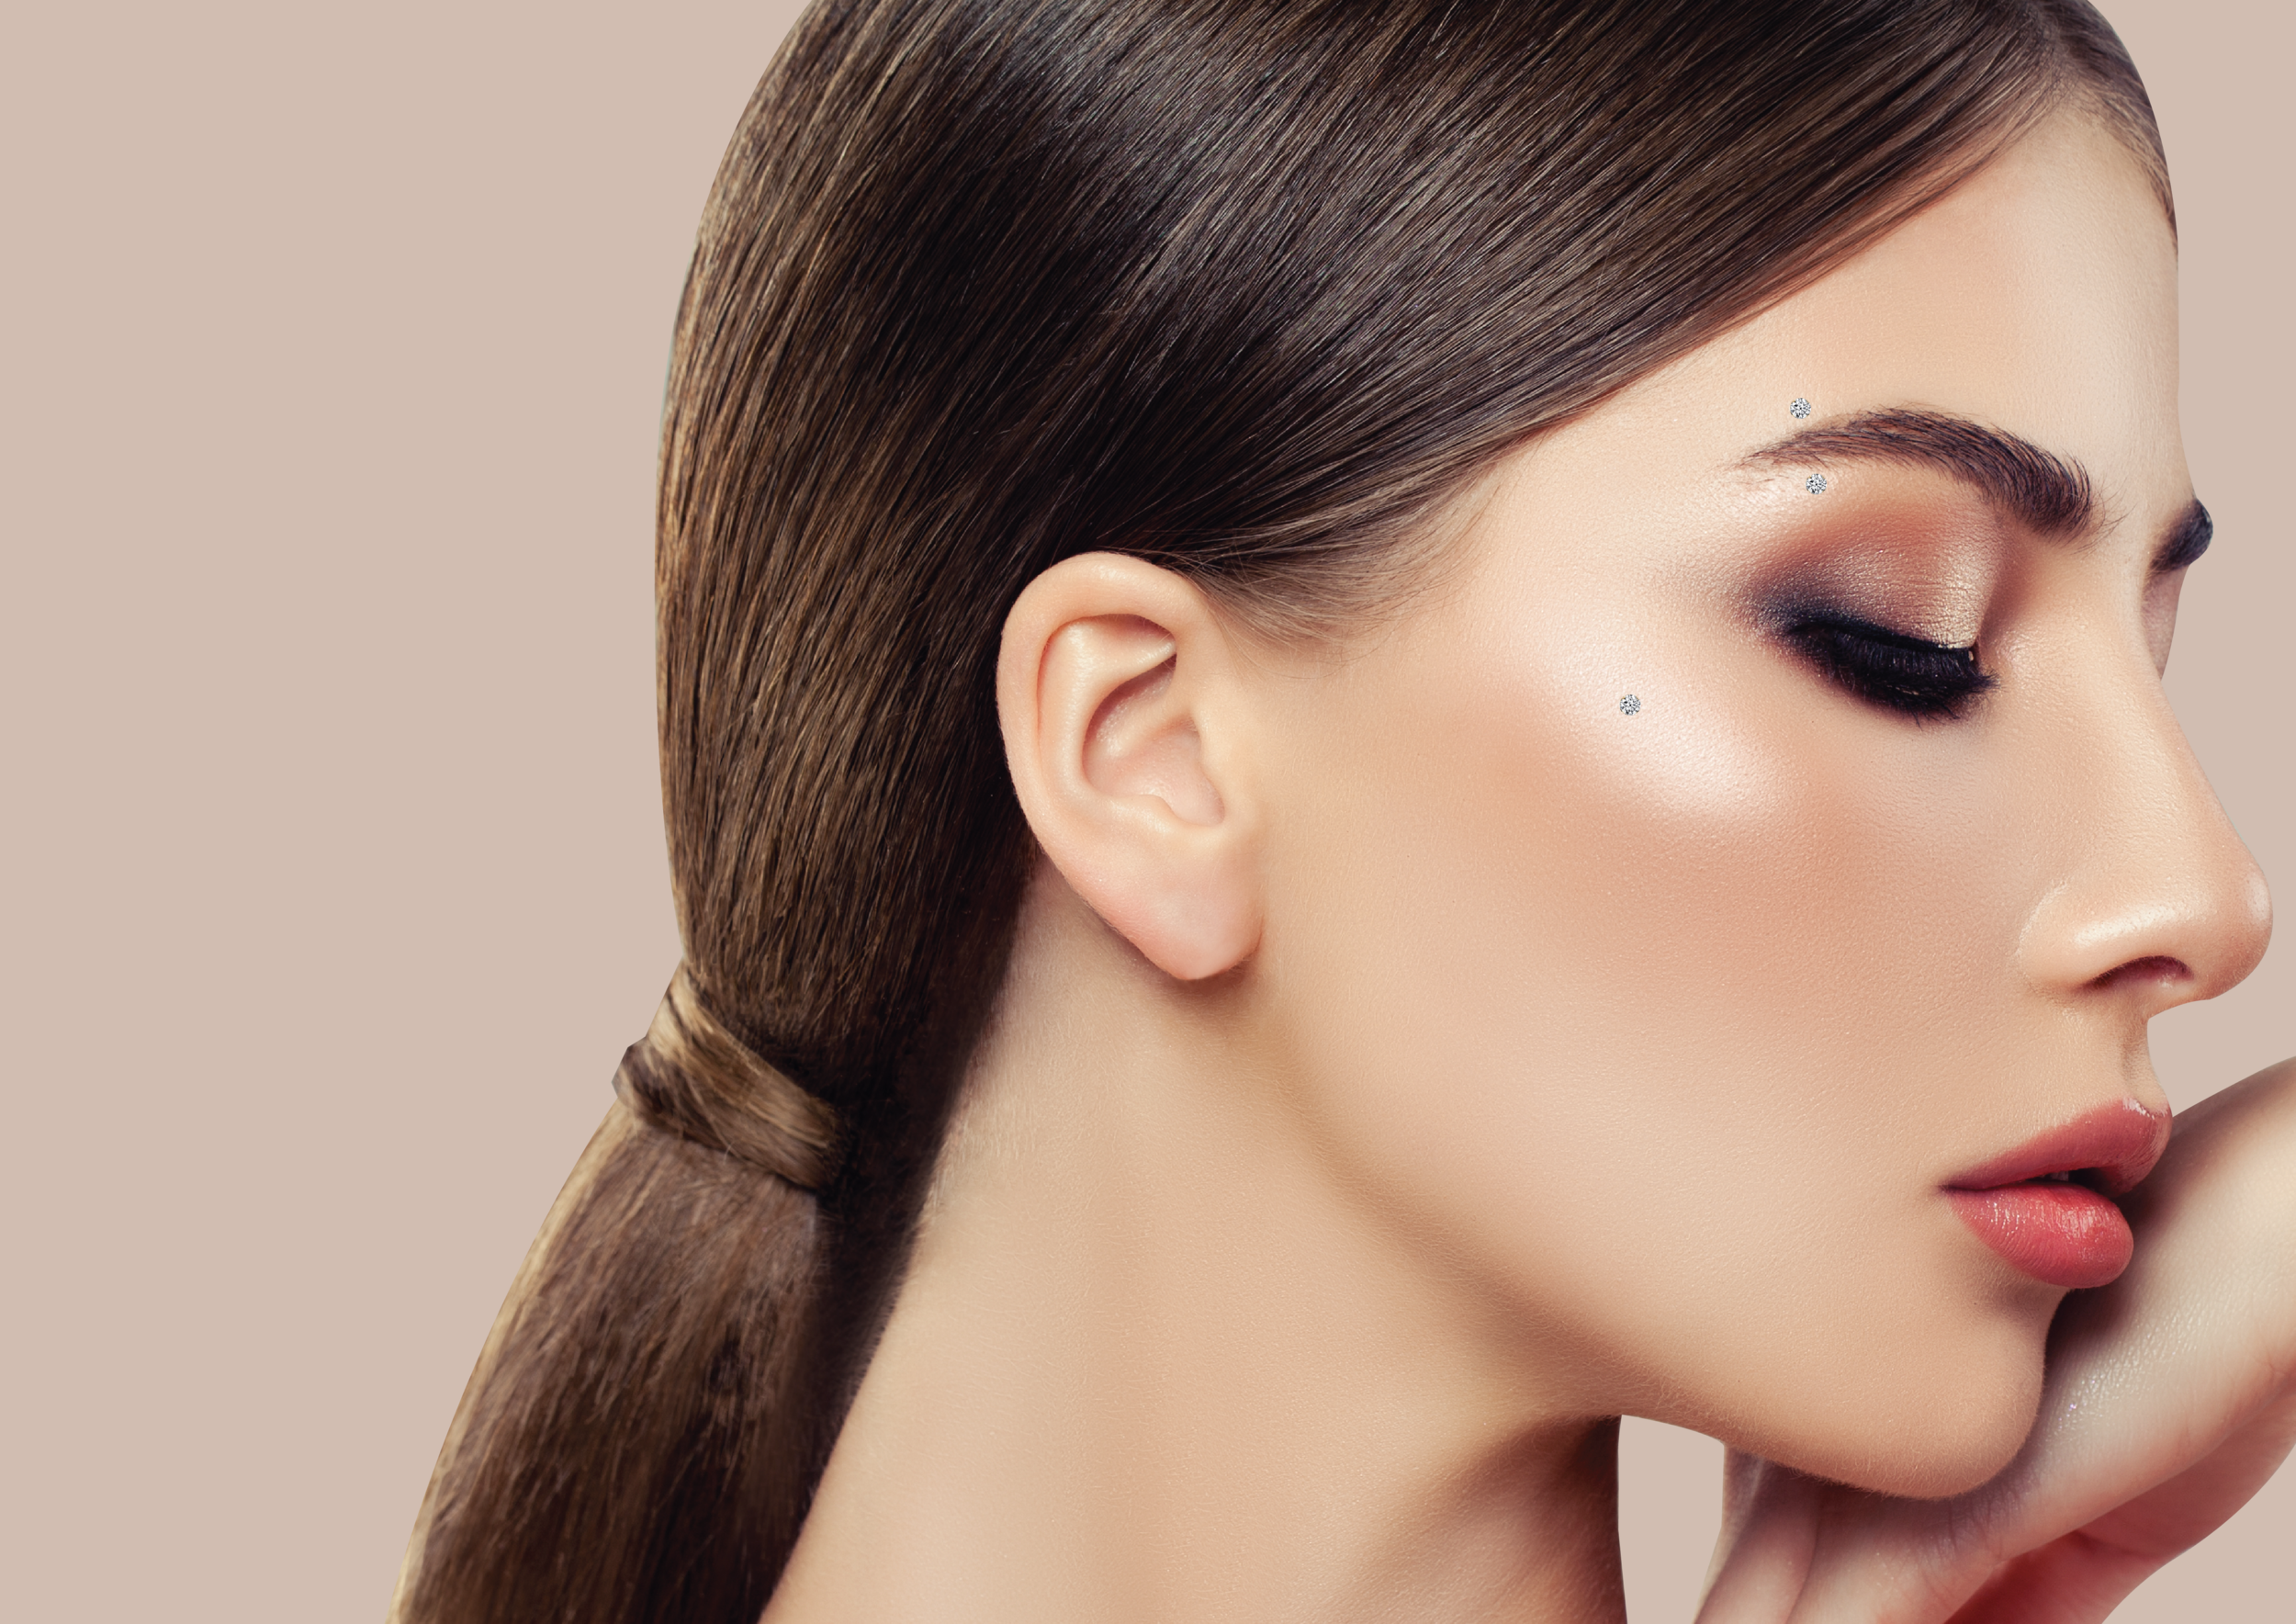 Facial Piercings -